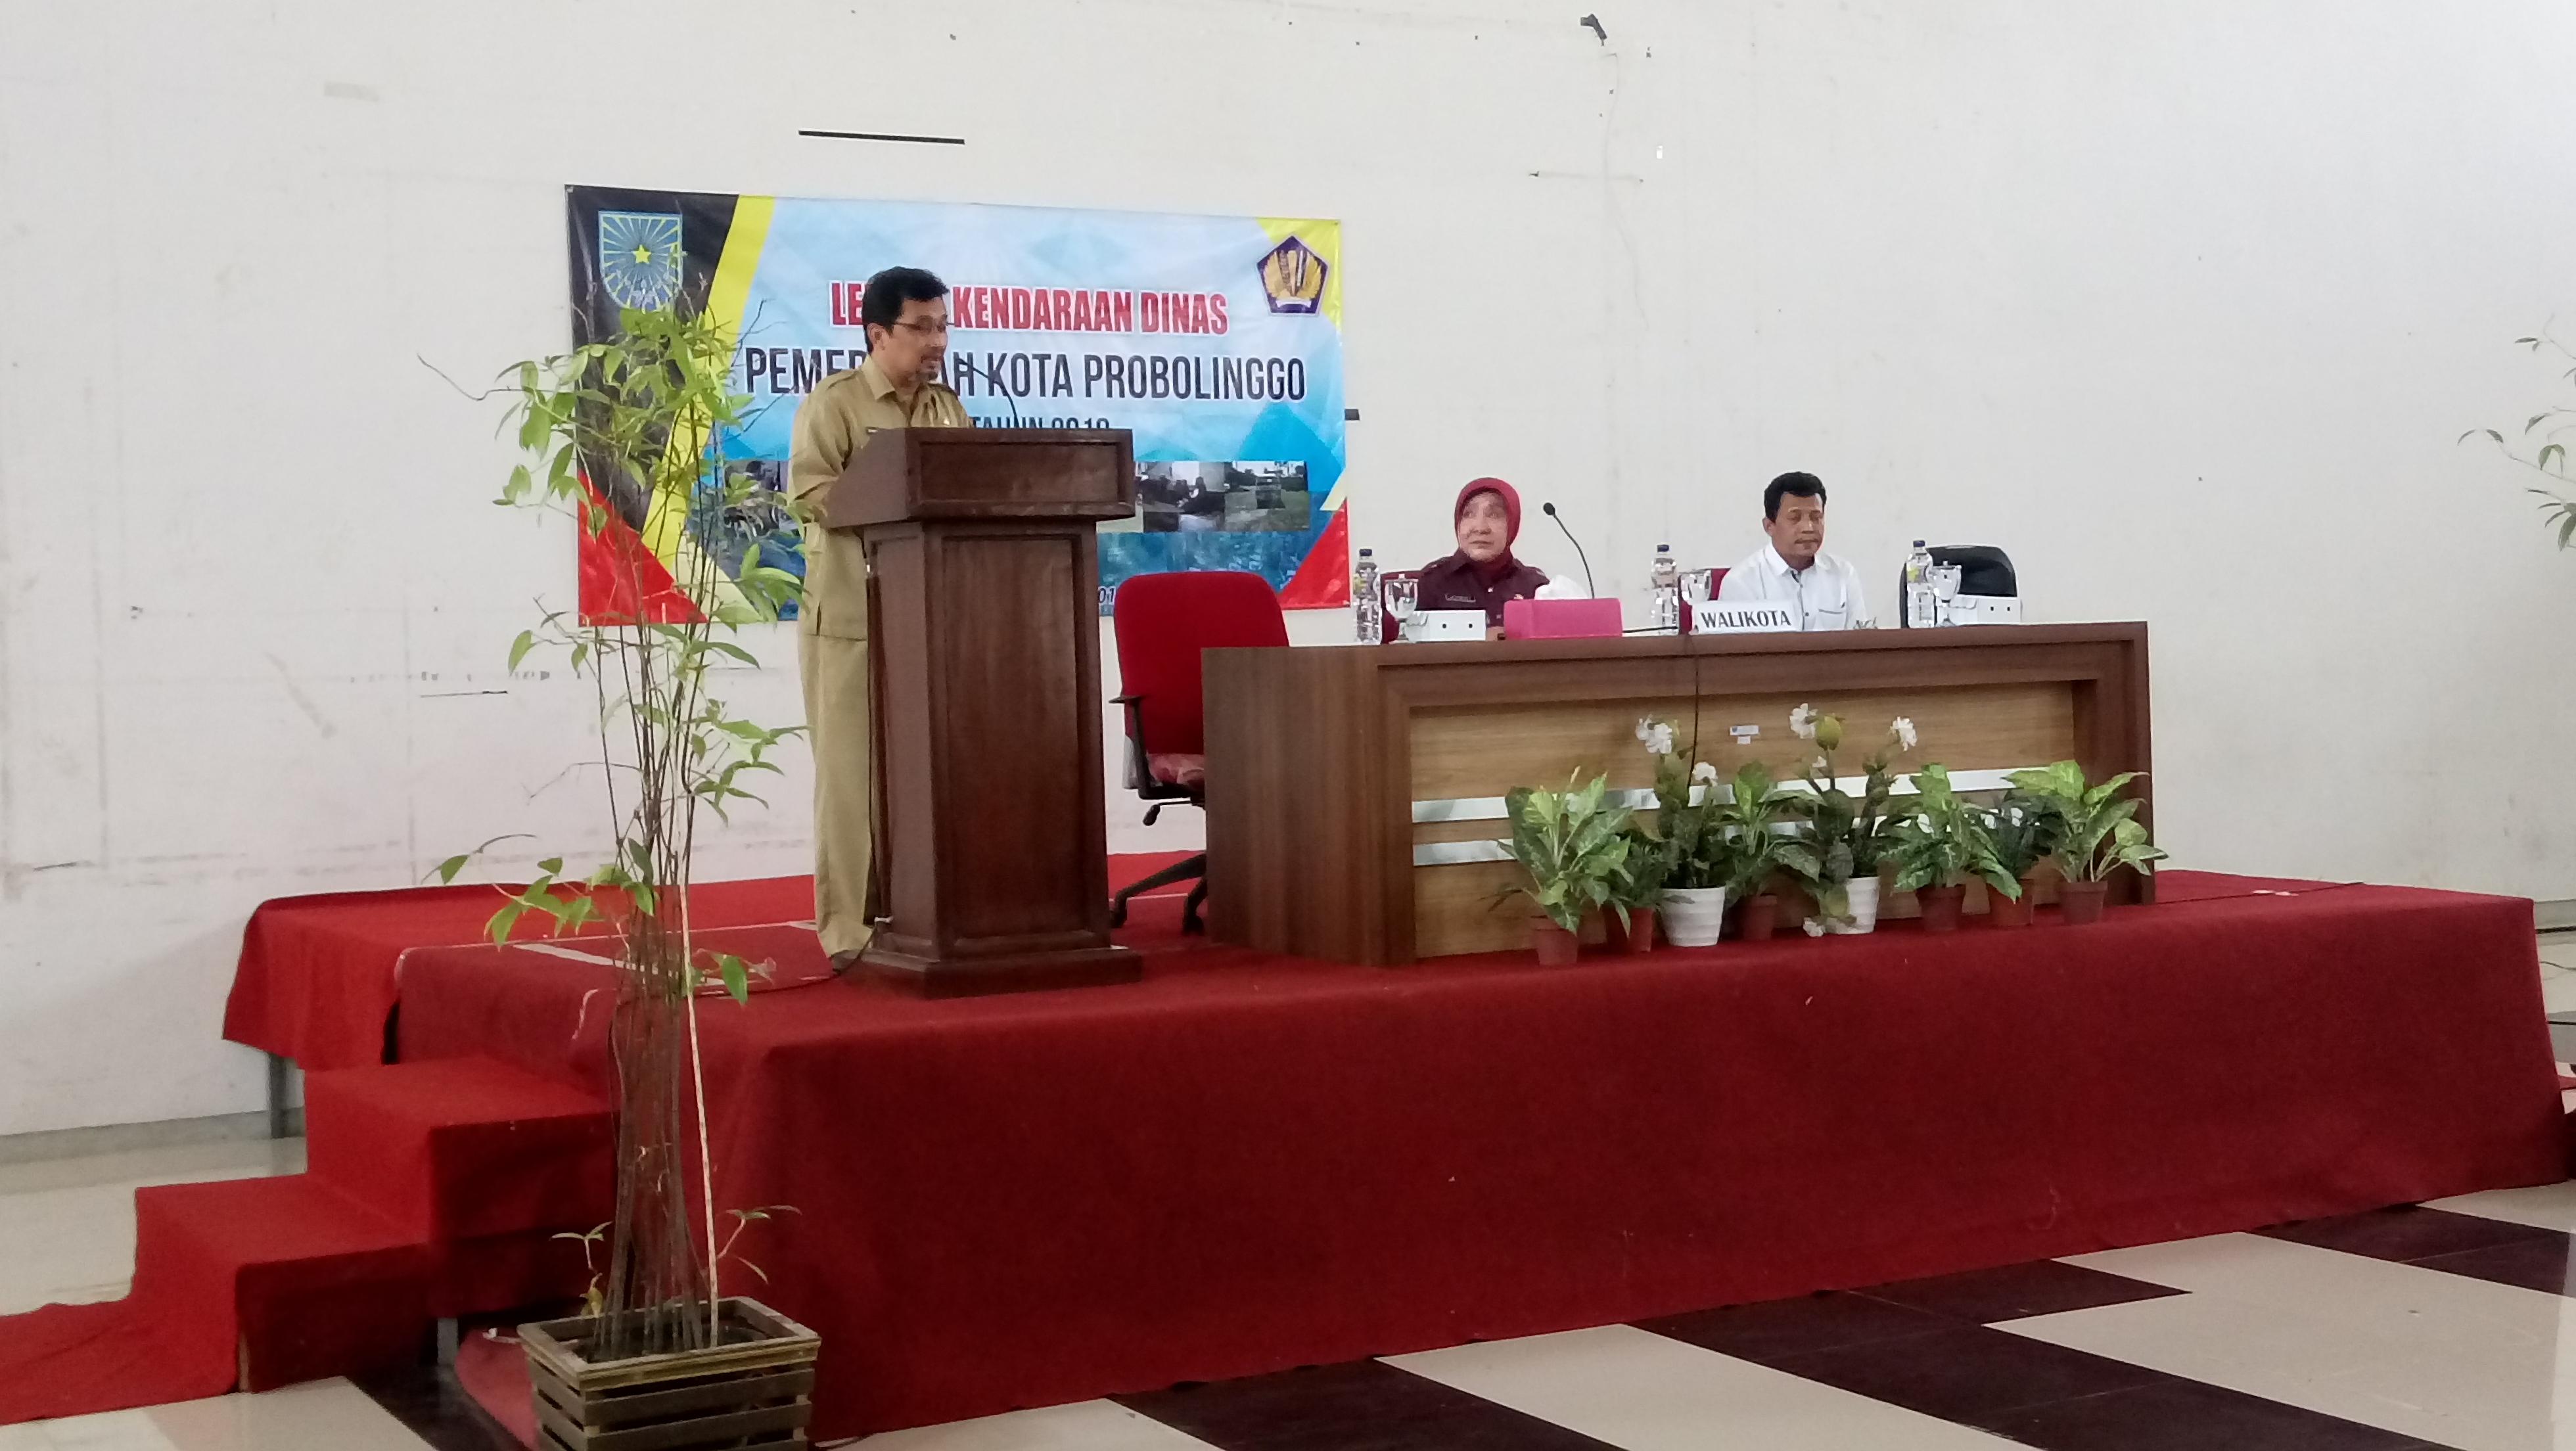 Lelang Penghapusan BMD Pemkot Probolinggo oleh KPKNL Jember